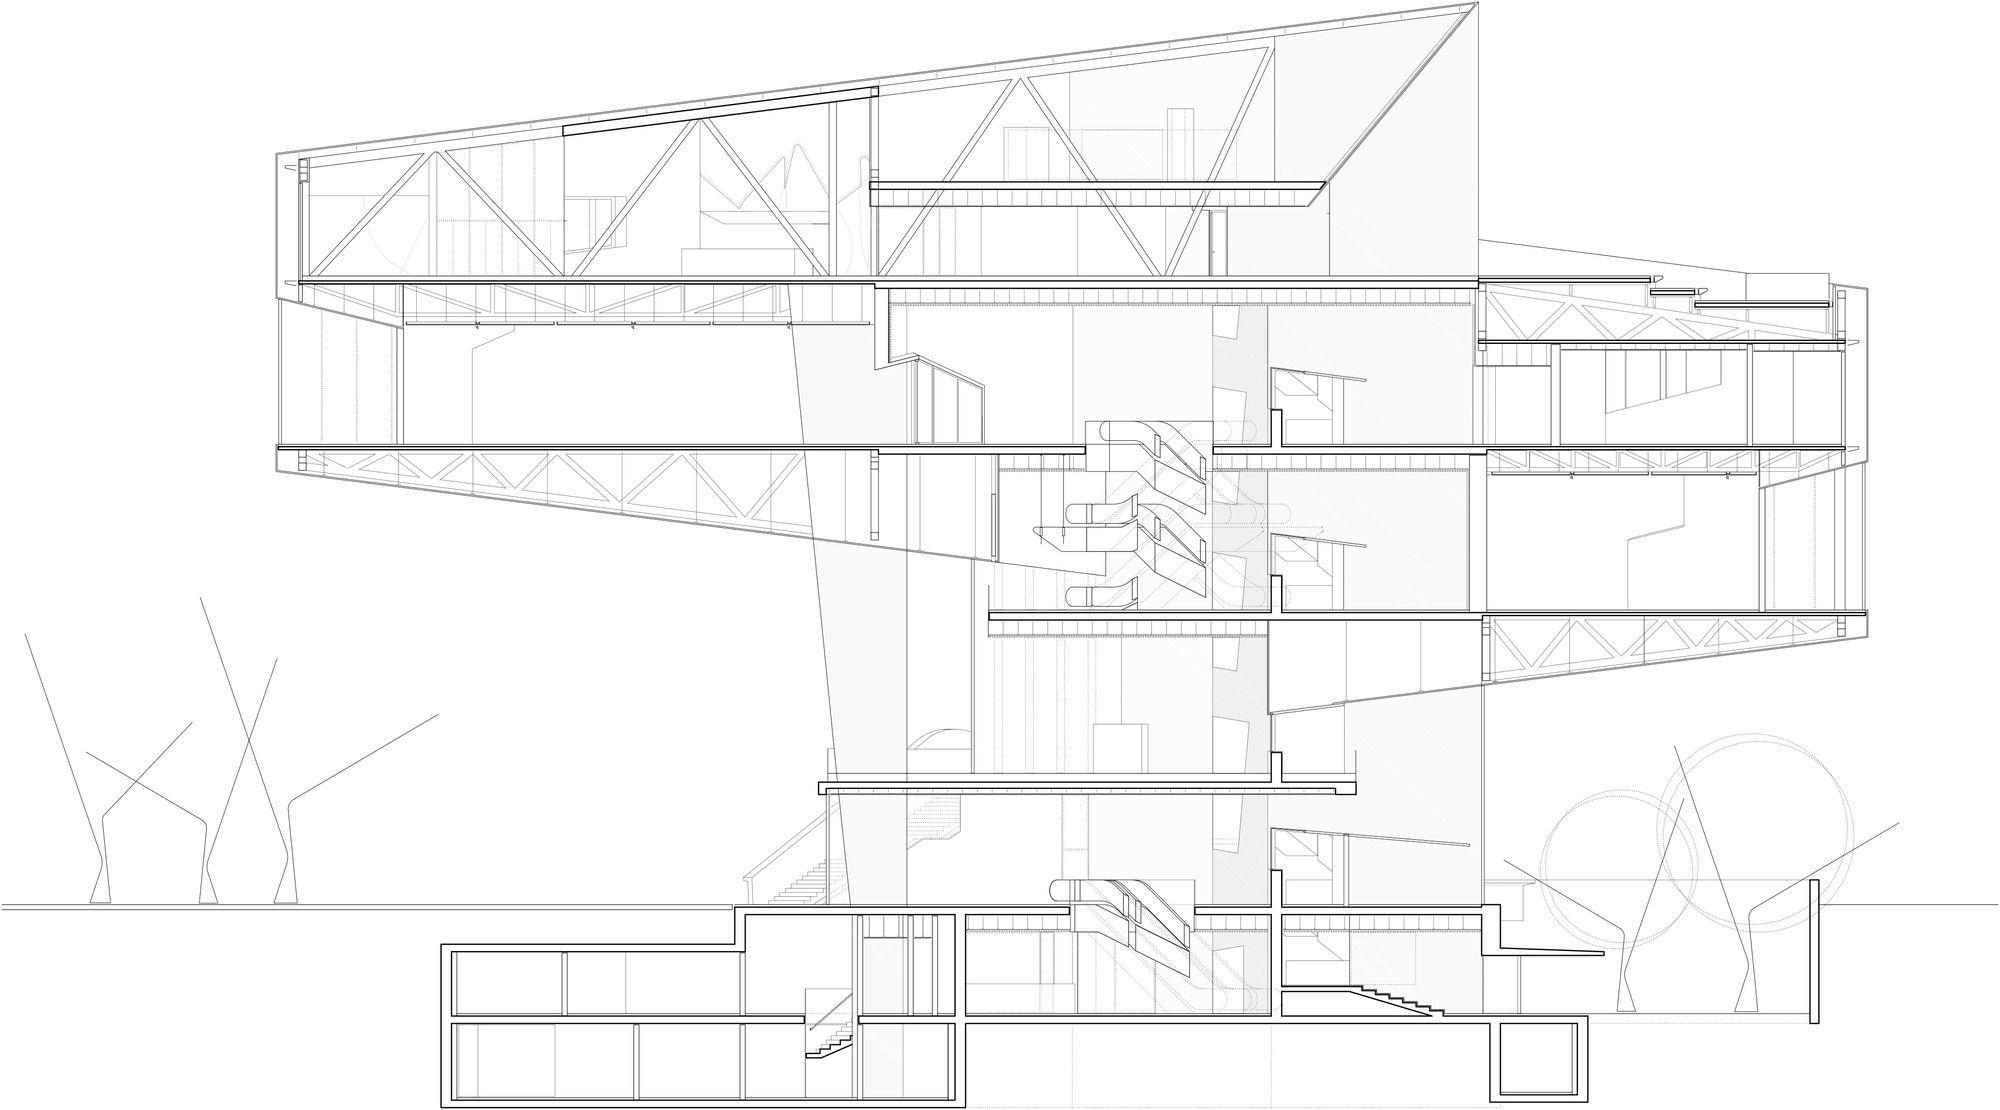 Galeria de caixaforum zaragoza estudio carme pinos 37 technical draw - Estudio arquitectura zaragoza ...